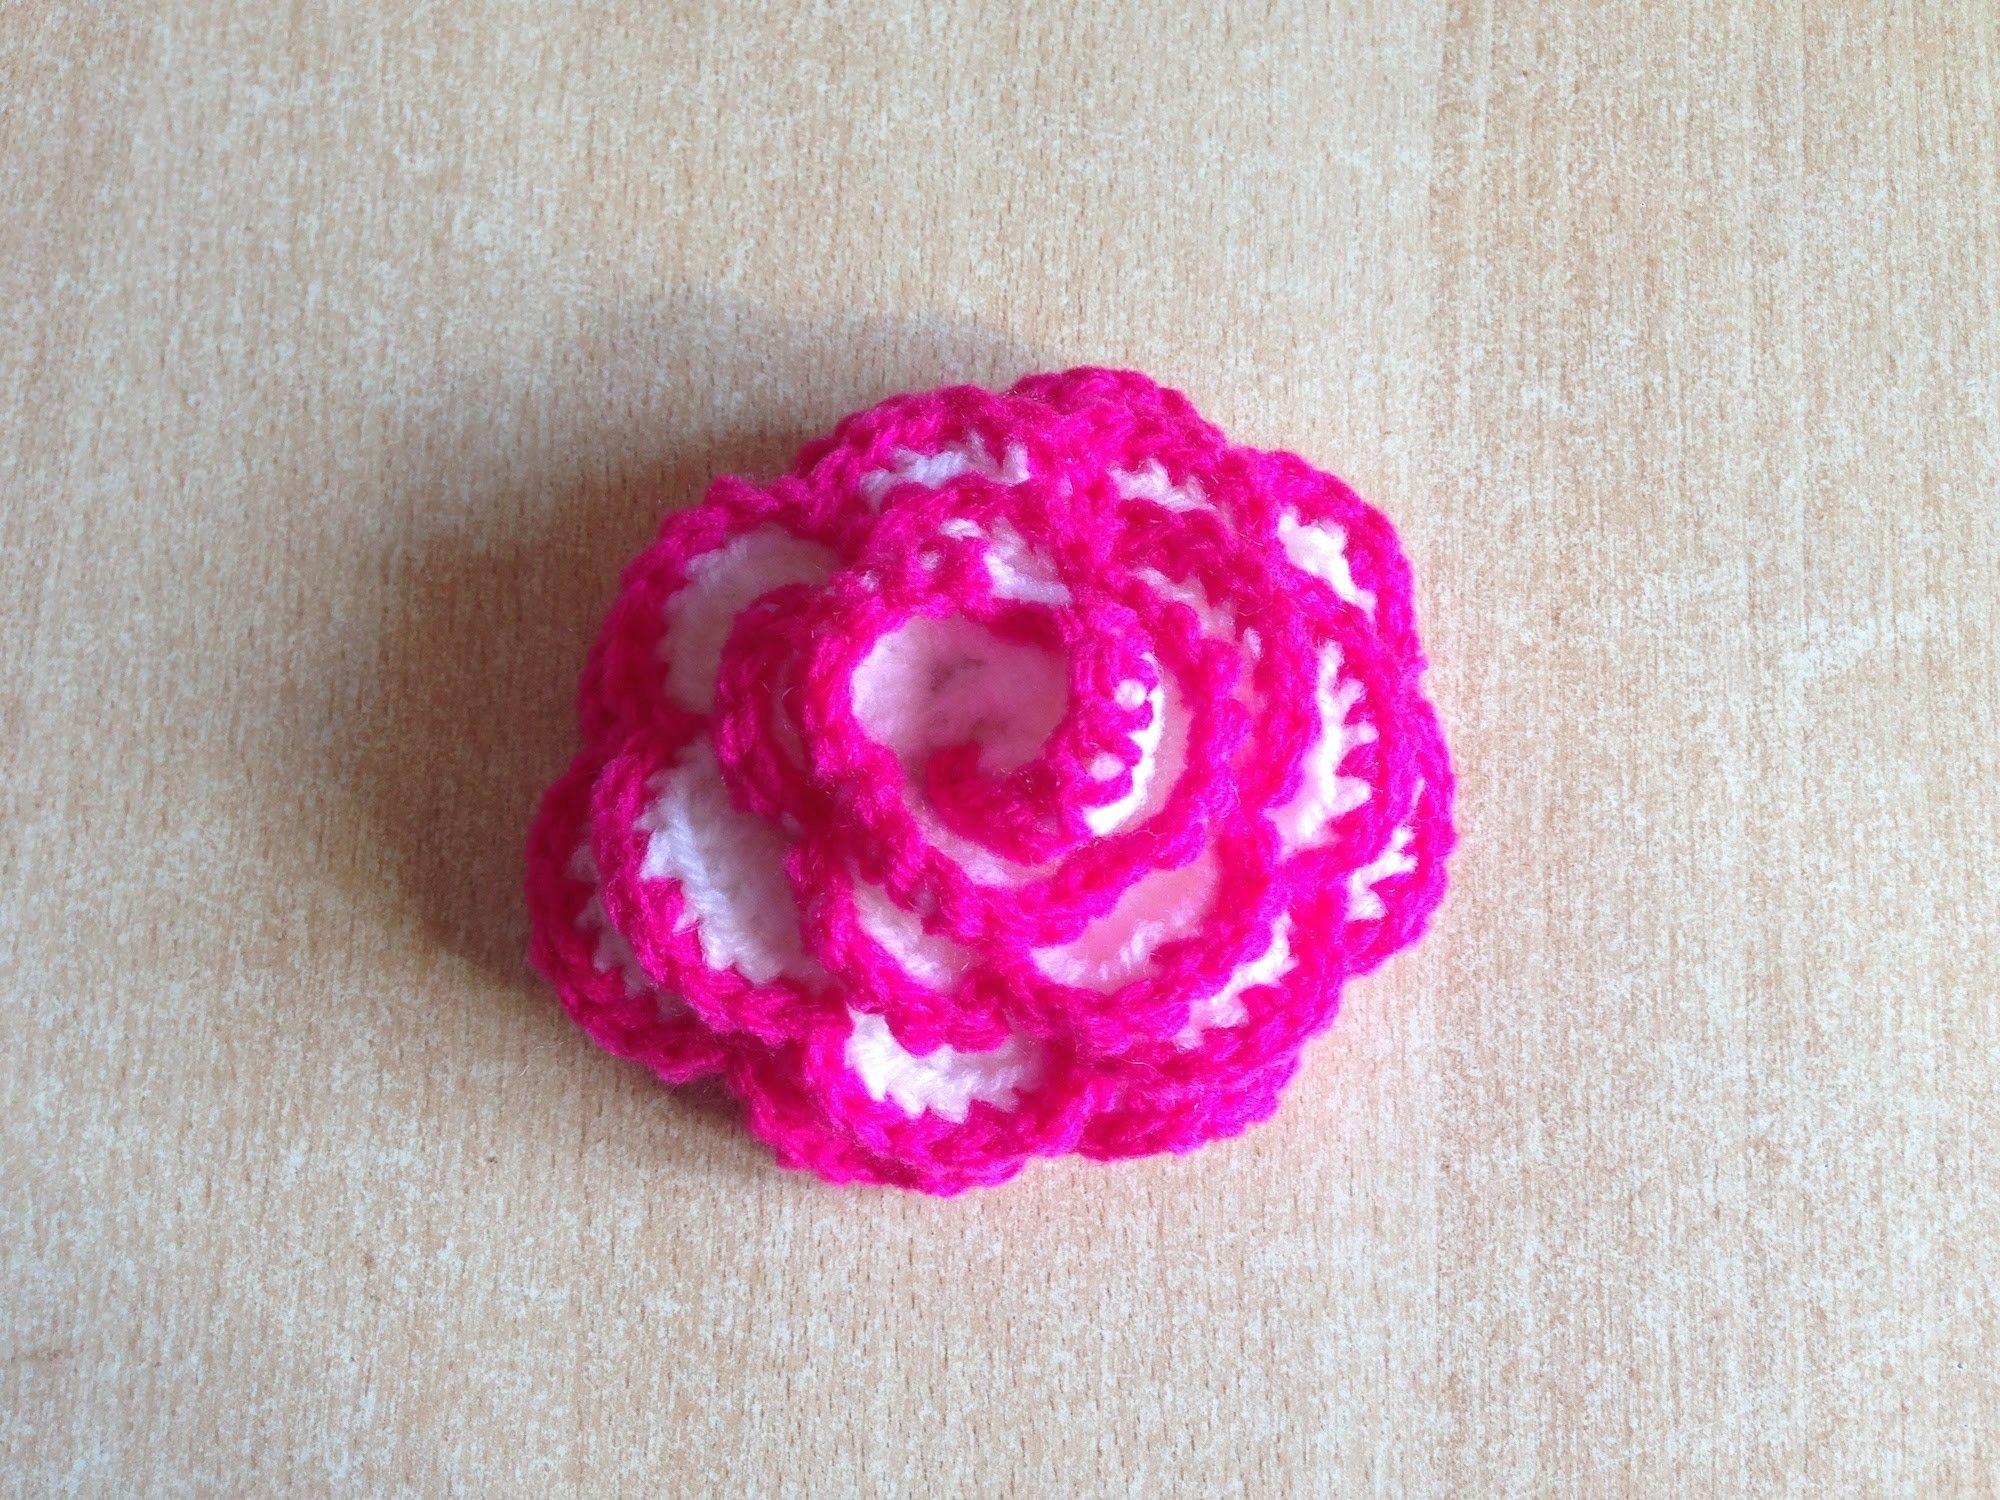 tuto rose facile au crochet fleurs pinterest le. Black Bedroom Furniture Sets. Home Design Ideas